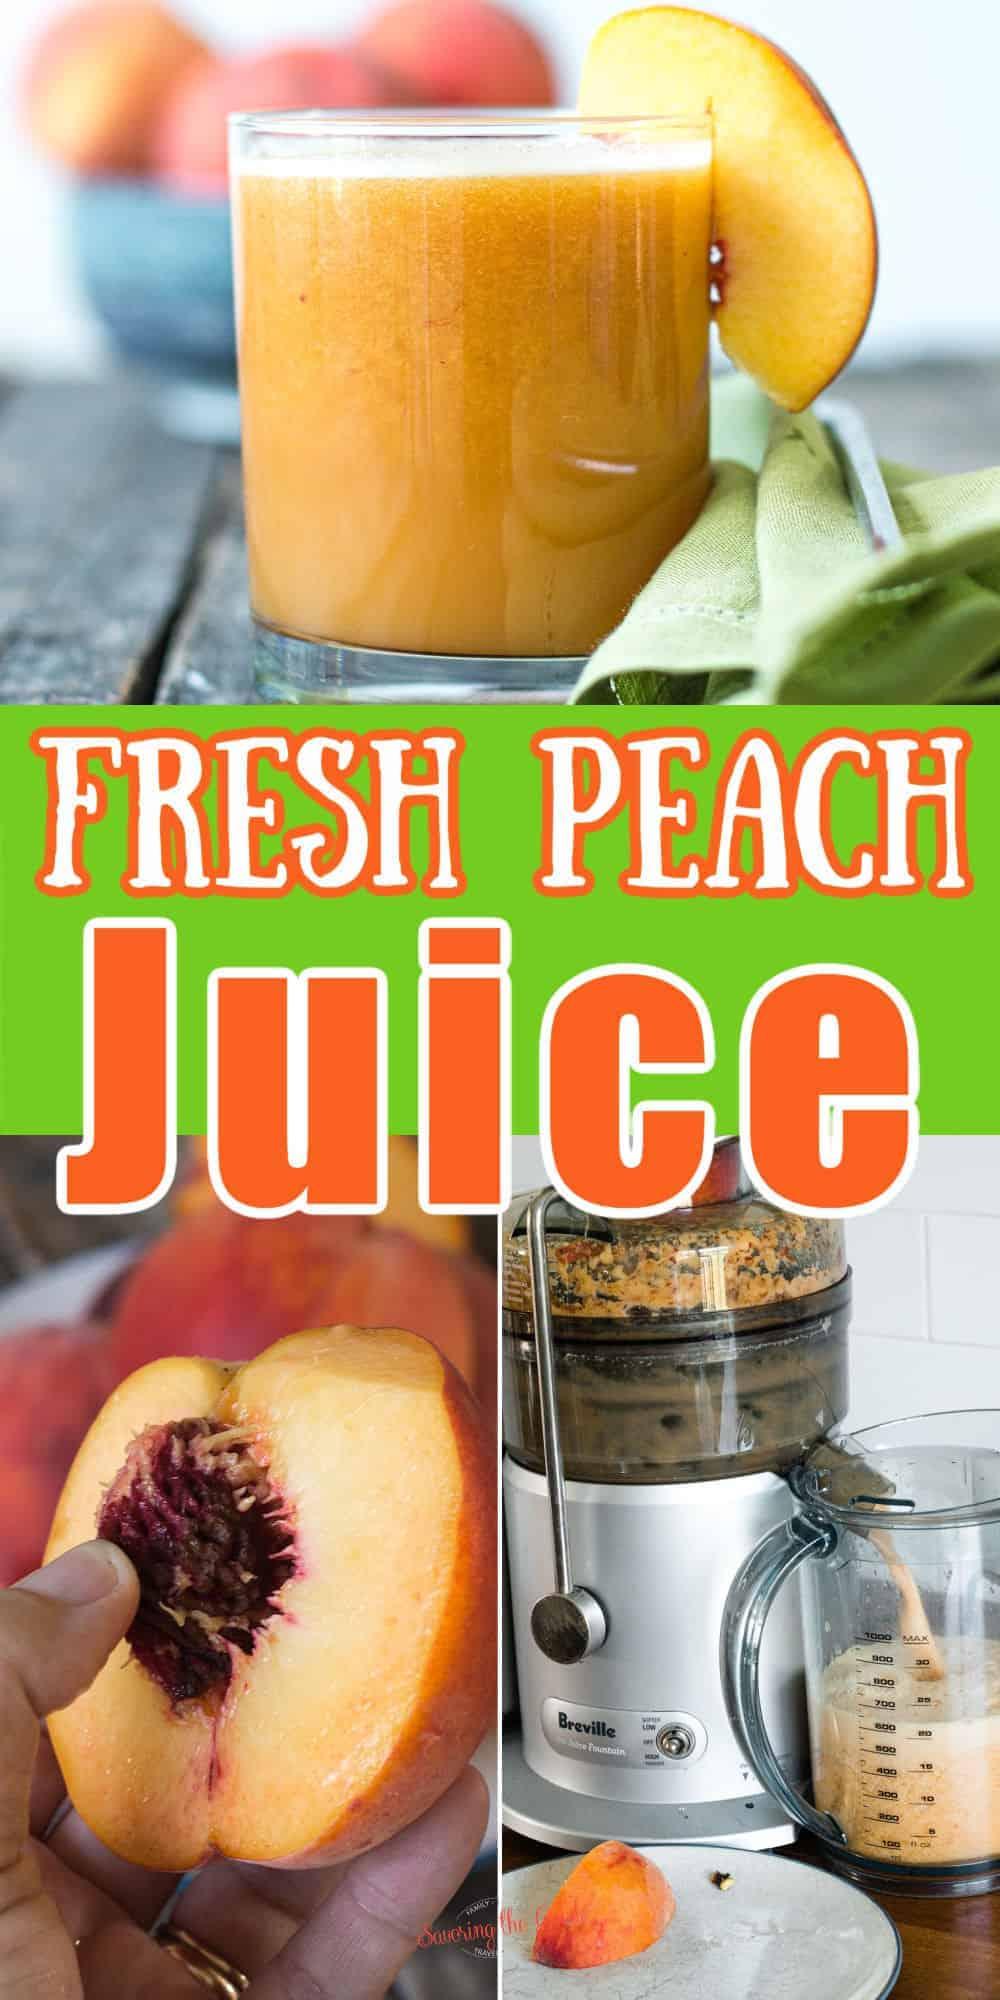 3 image peach juice Pinterest image 1 image of finished glass, 1 image of peach being pitted, 1 image of juice going through juice fountain